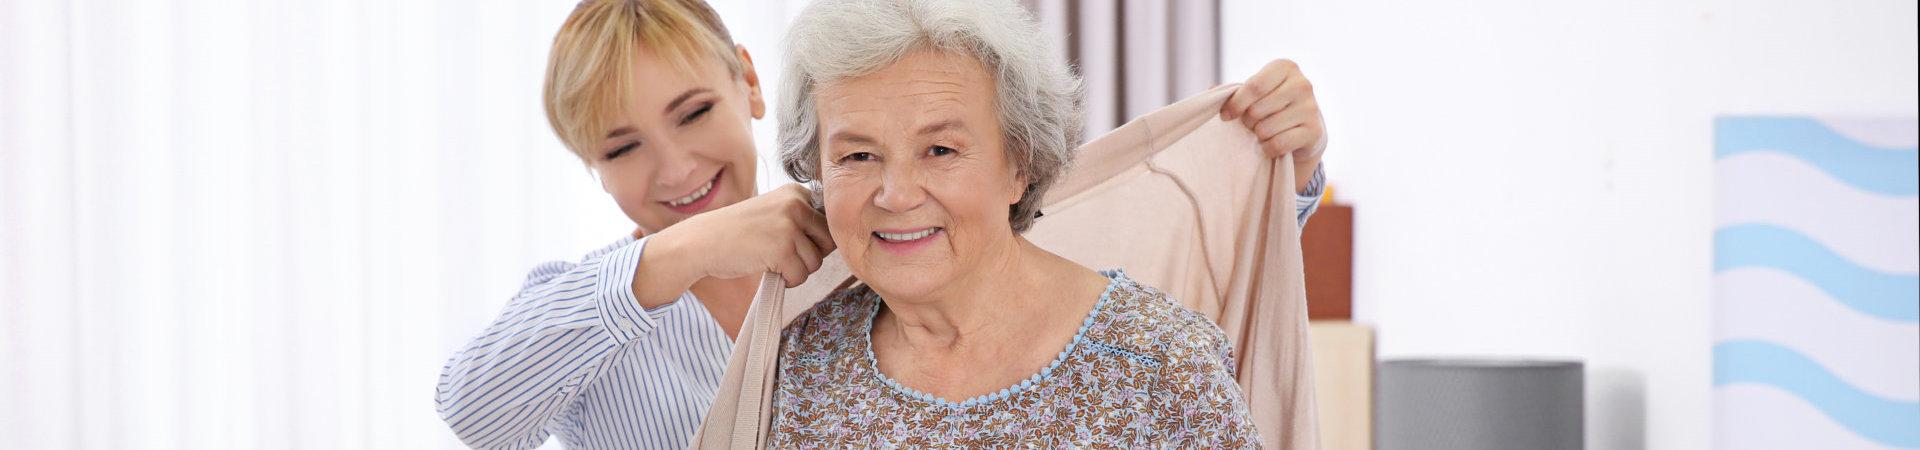 caregiver assisting senior woman